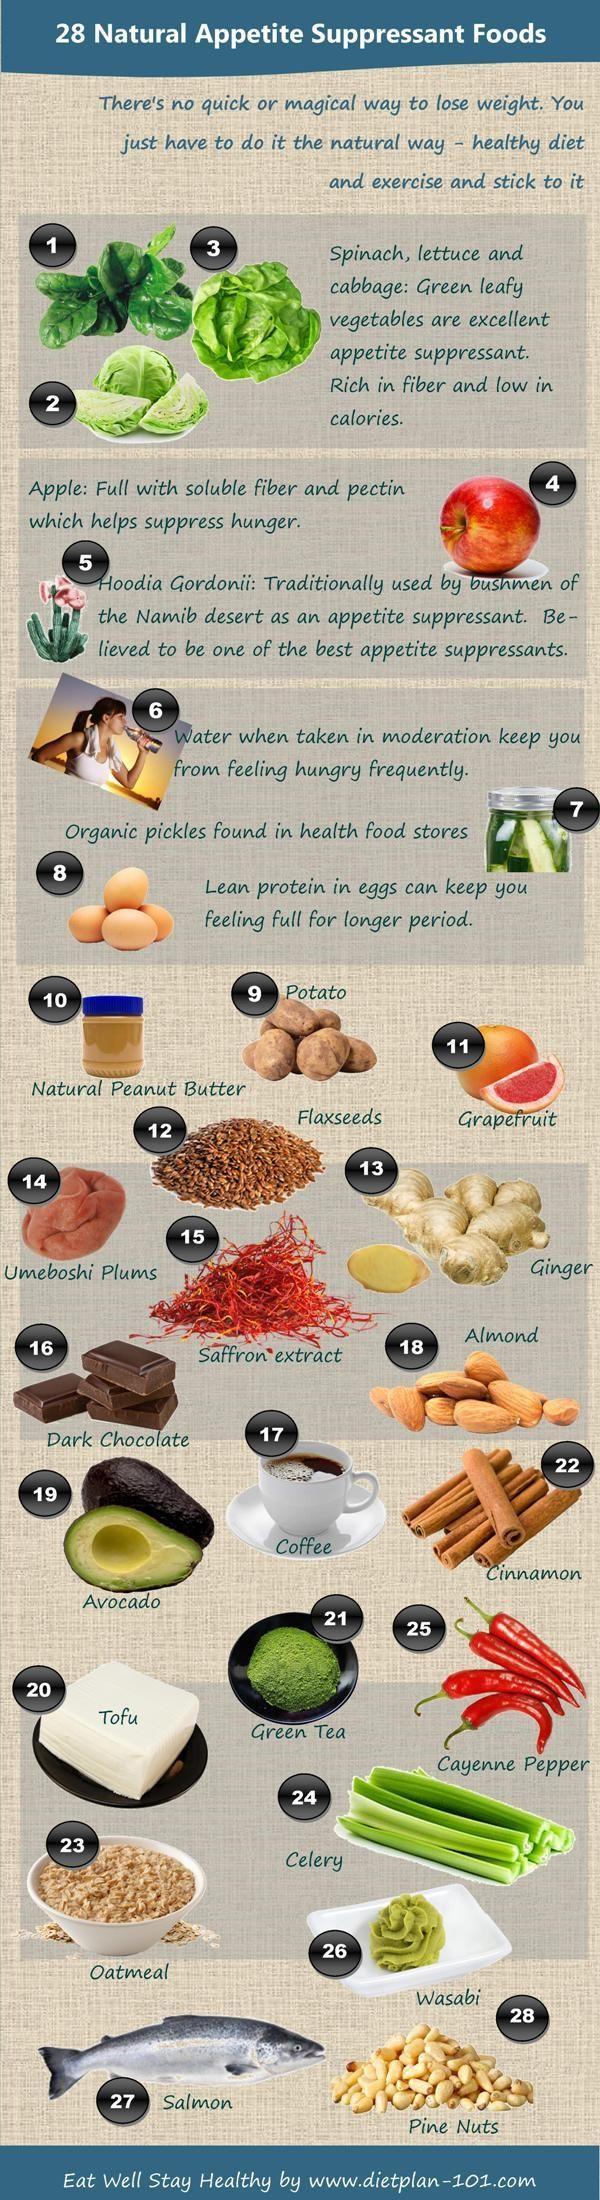 Best 28 Natural Appetite Suppressant Food List | Diet Plan 101